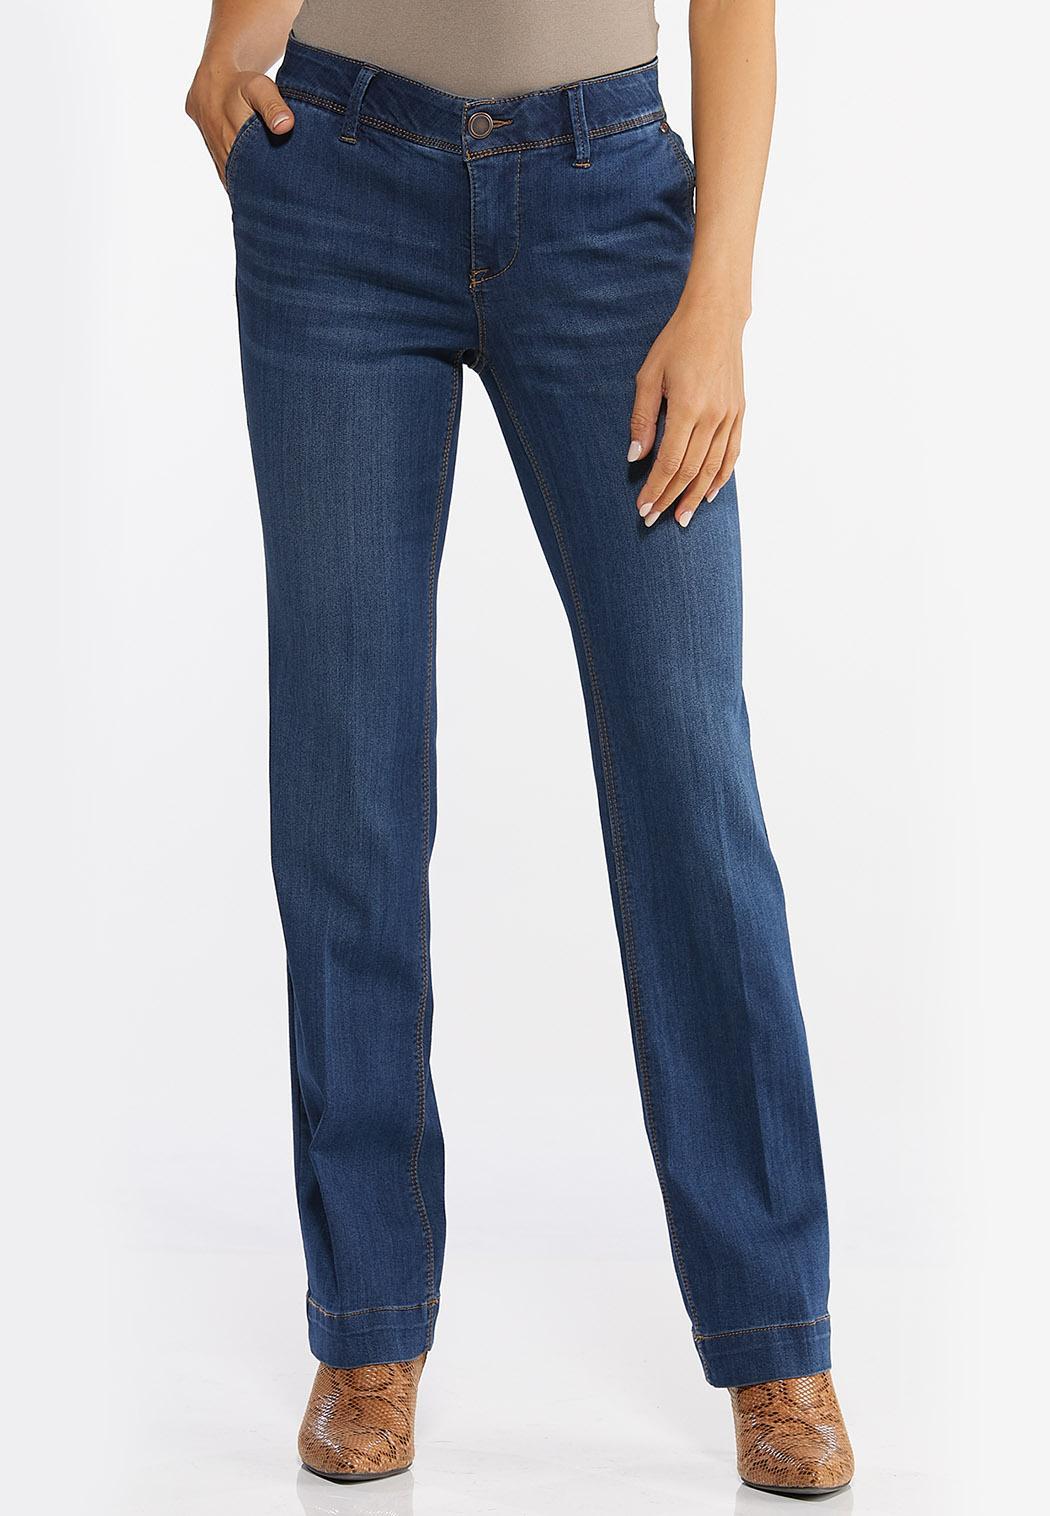 Petite Trouser Leg Jeans